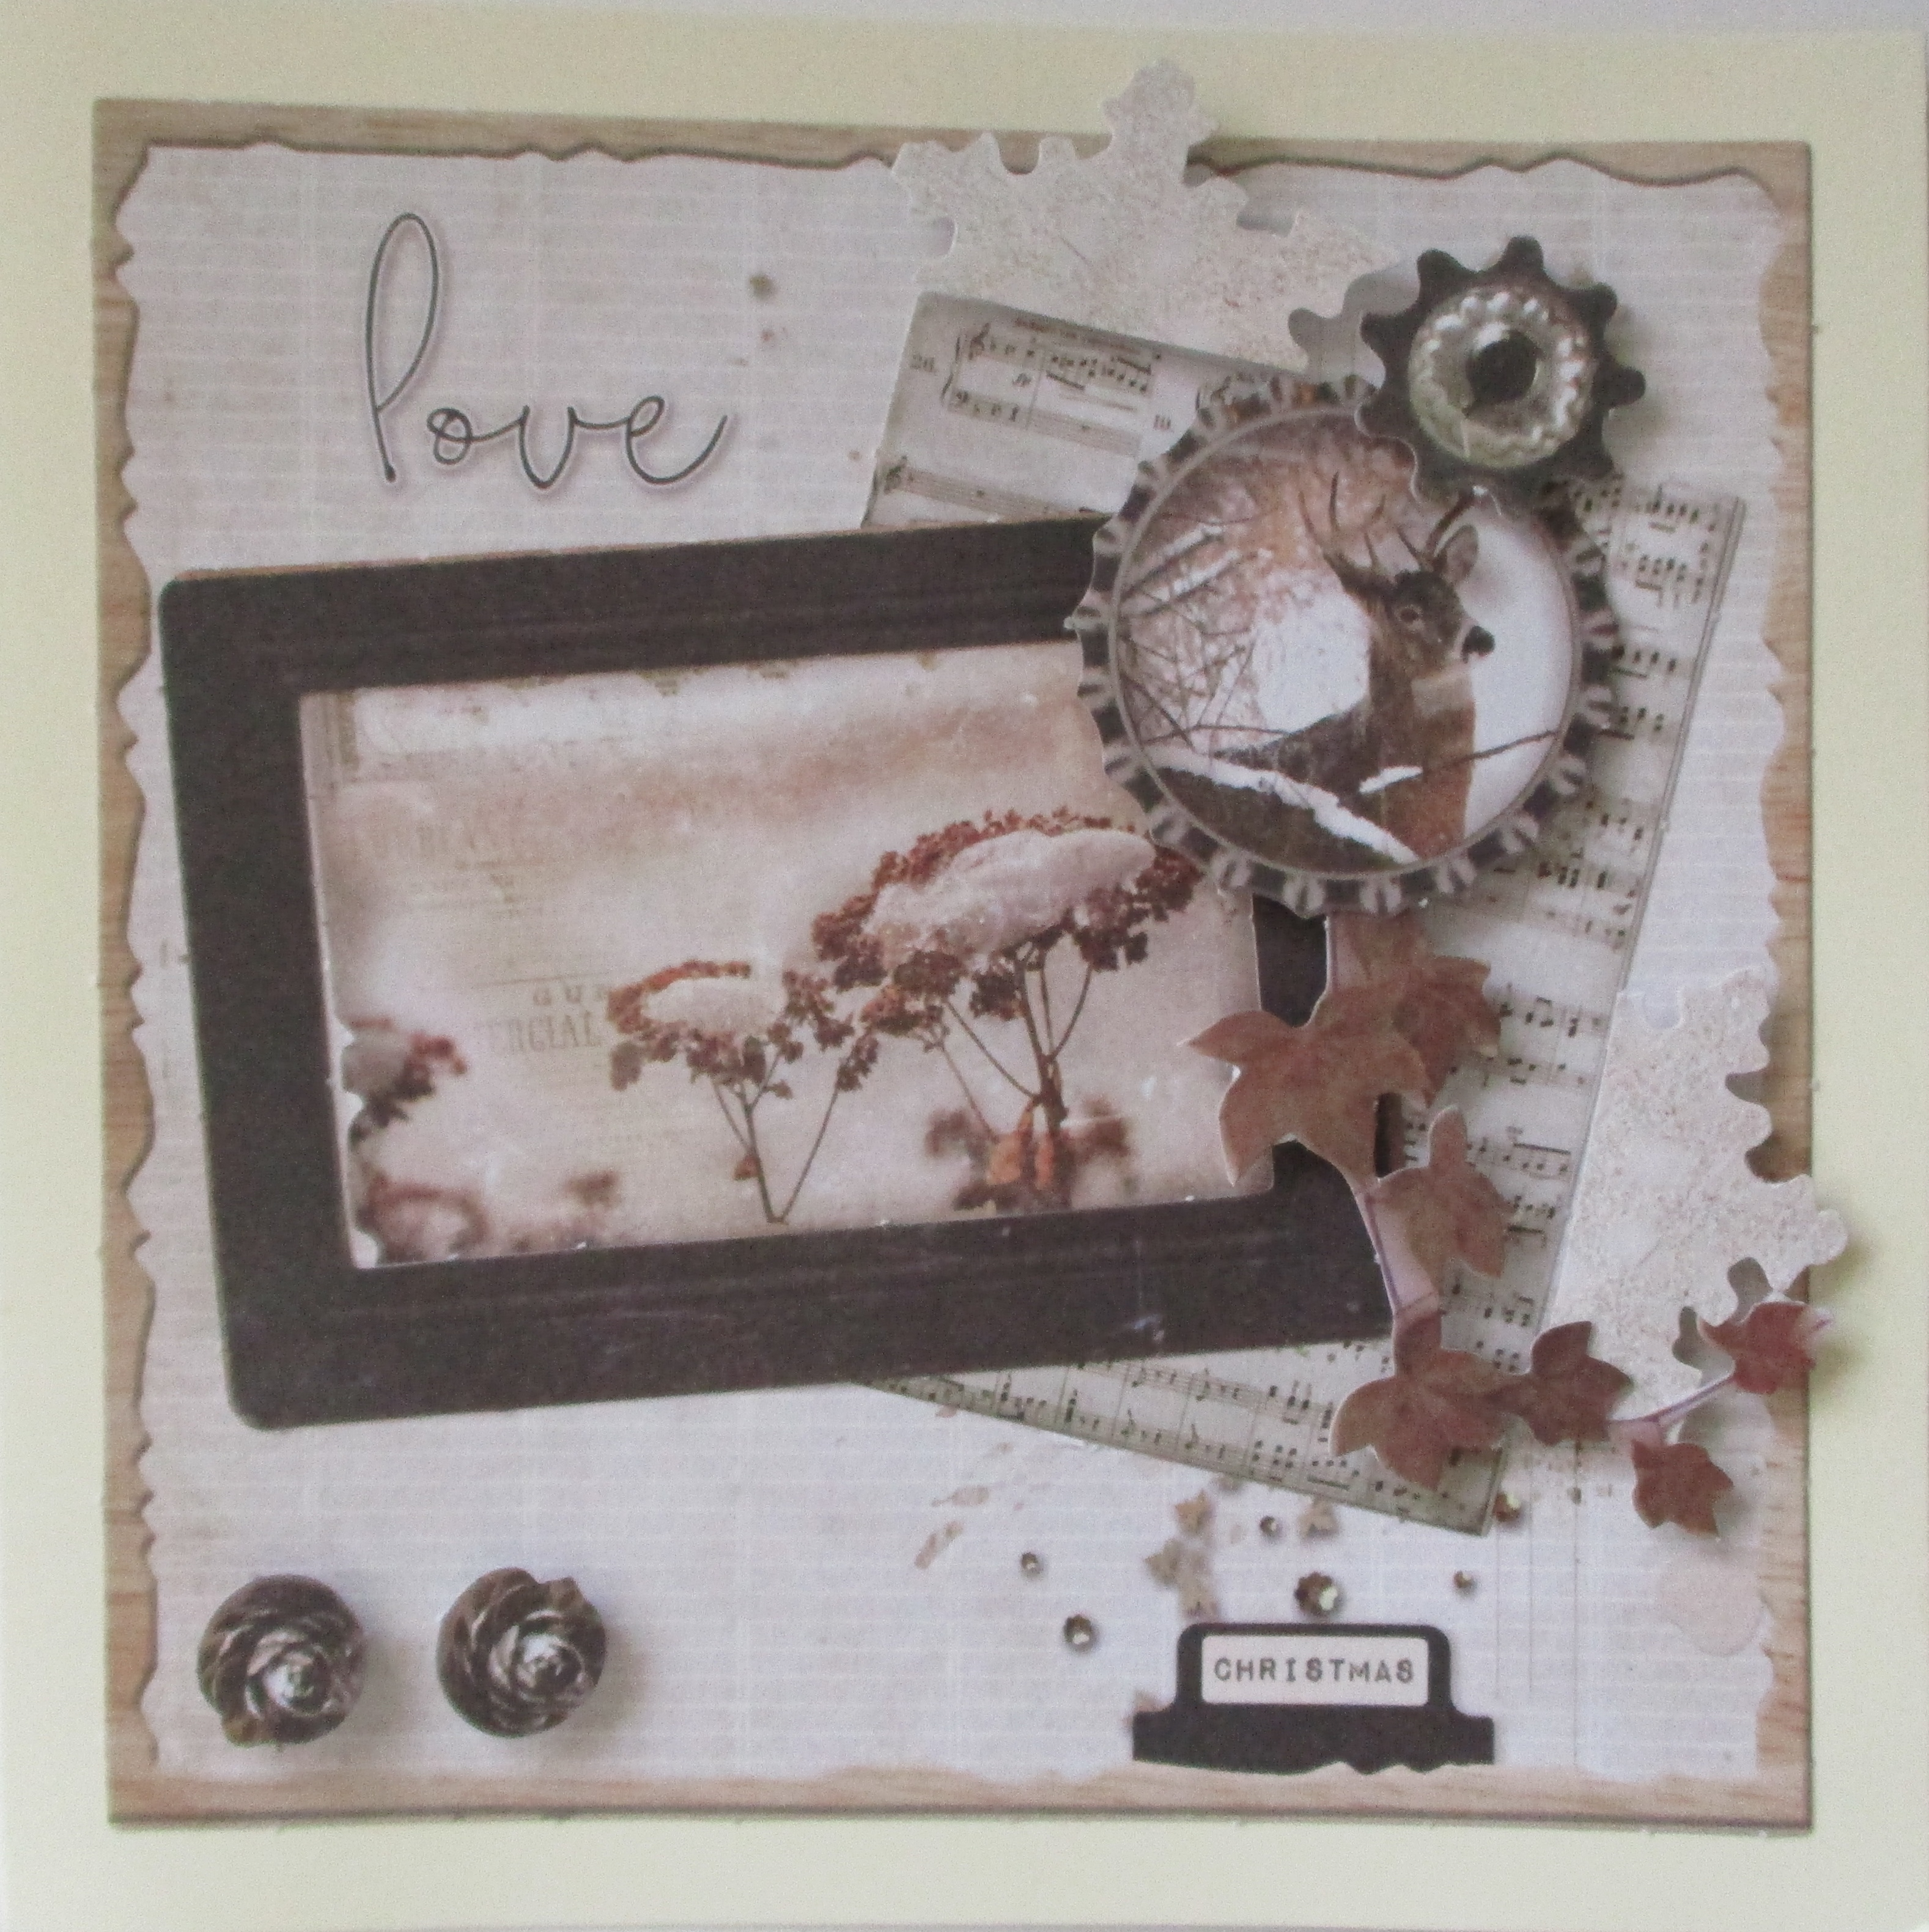 Meine Bastel Idee - Grußkarte Christmas Love